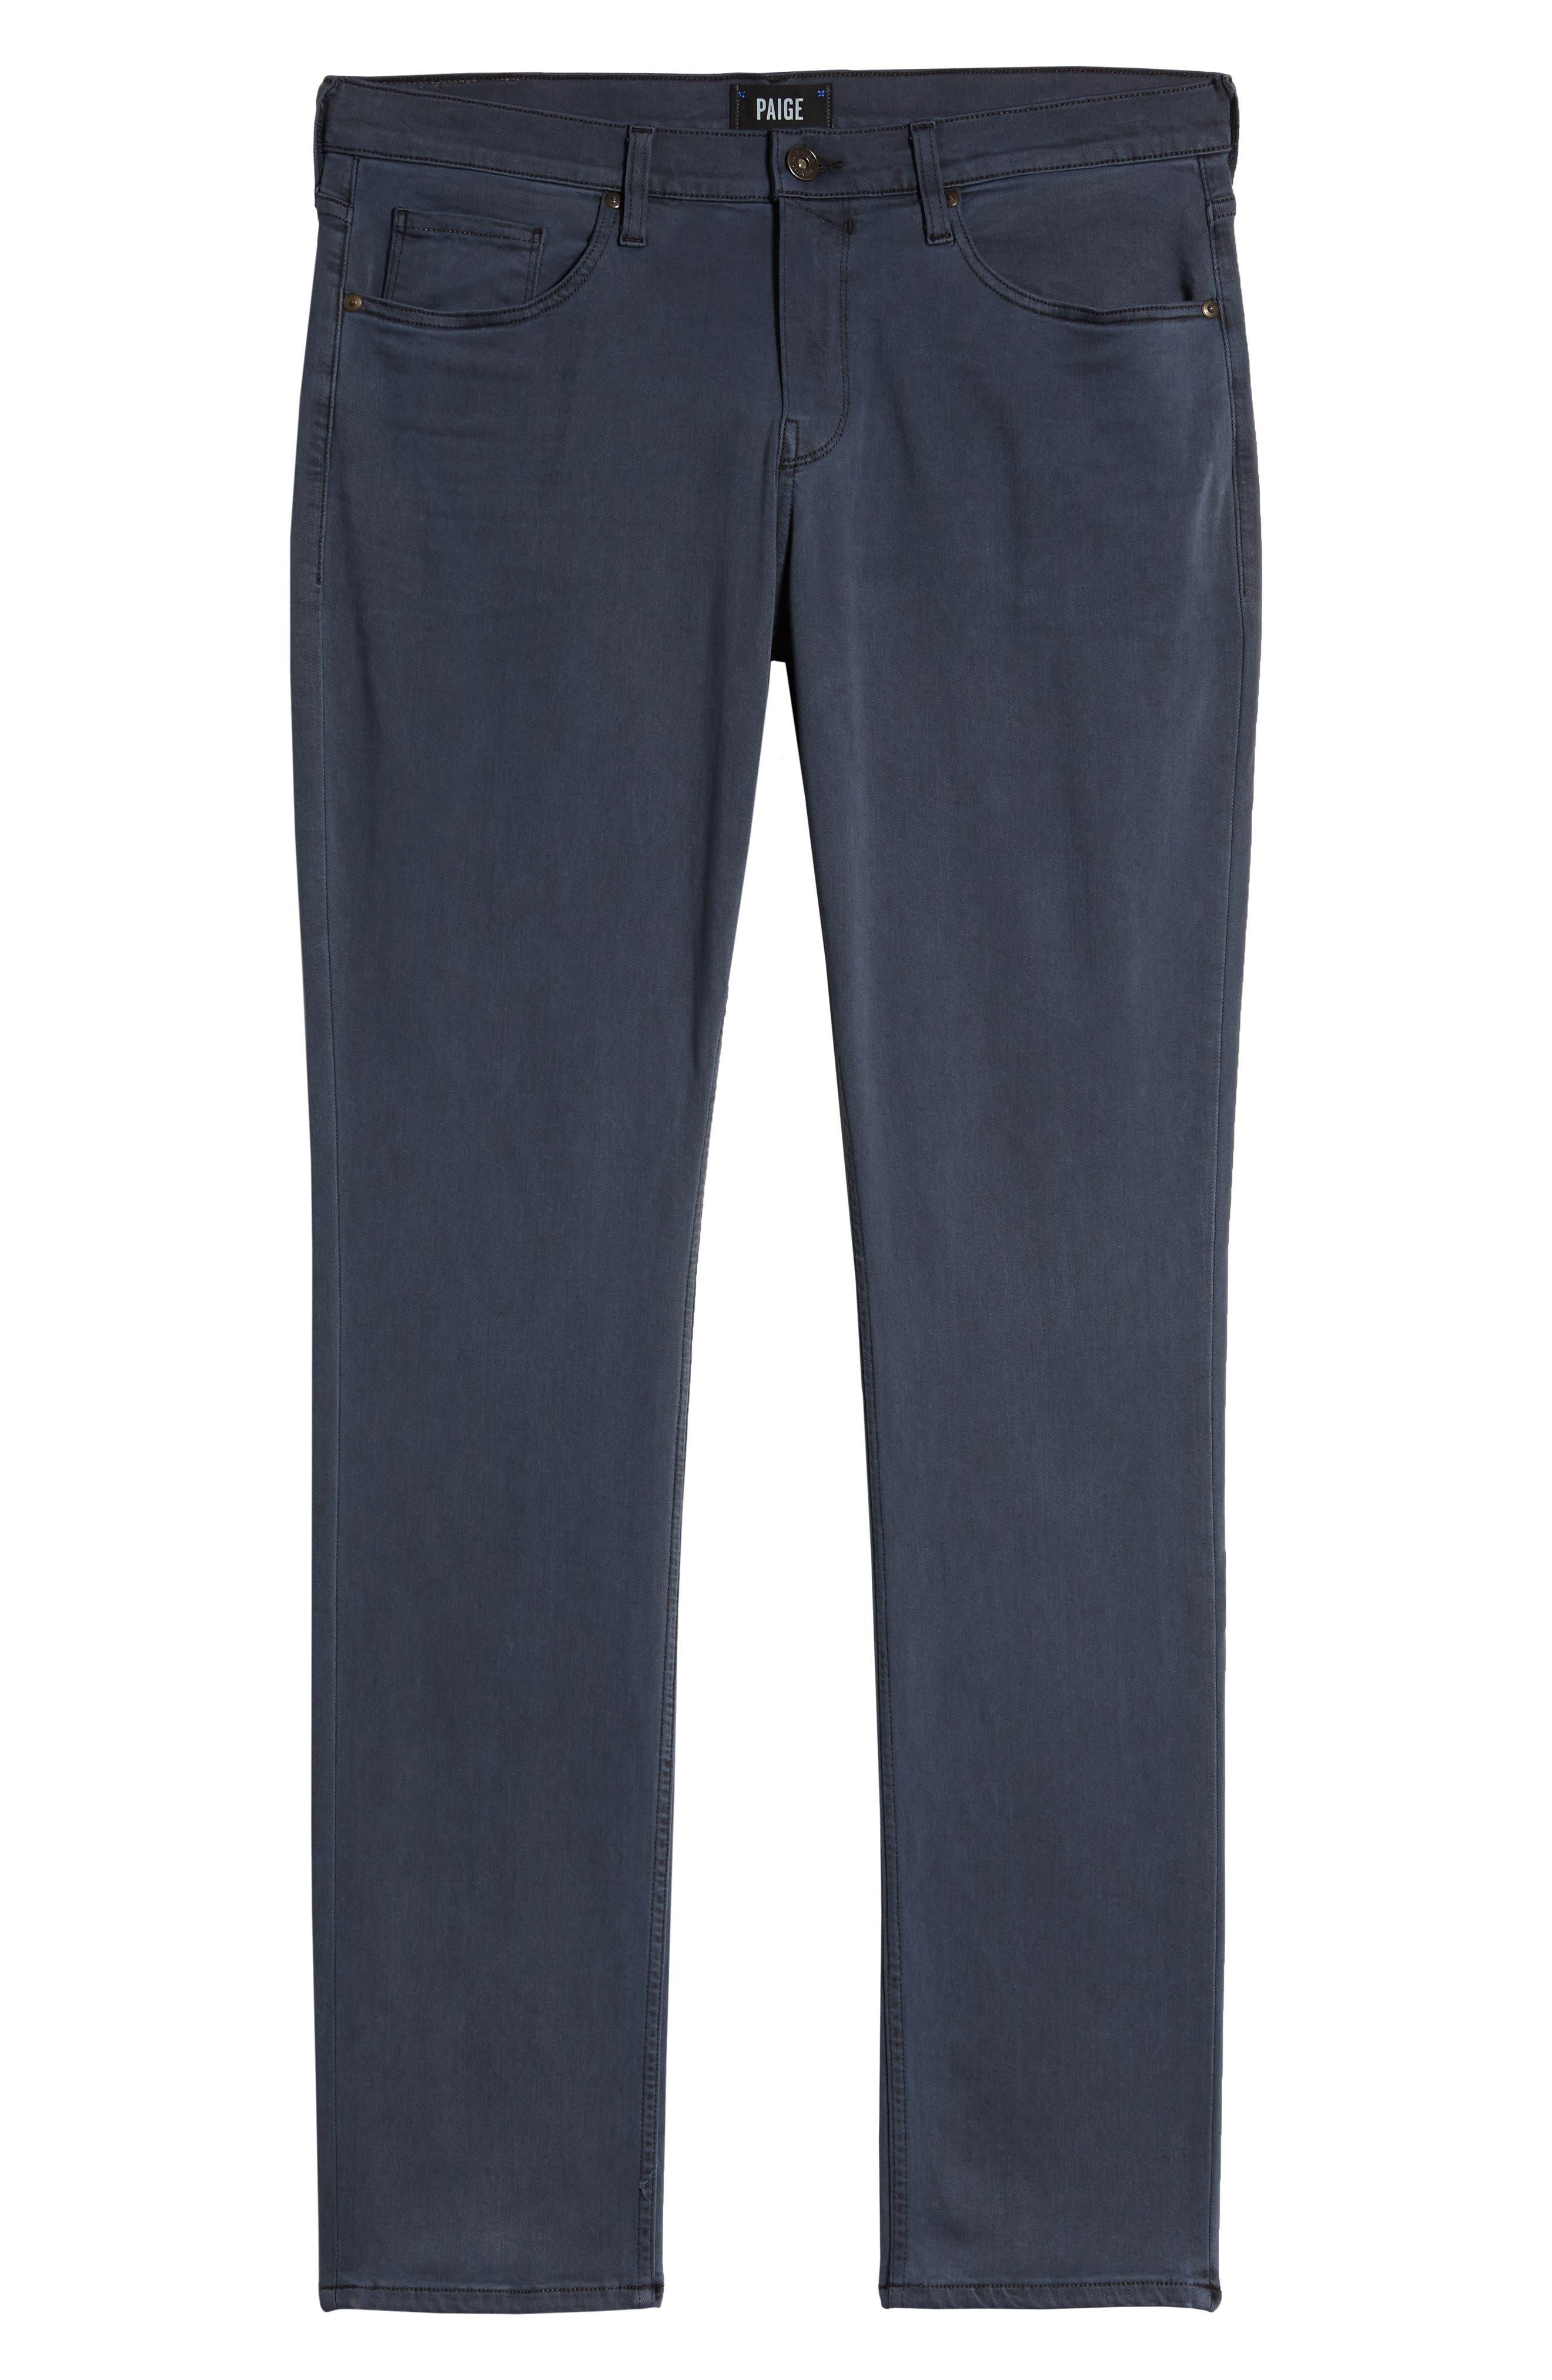 Transcend - Federal Slim Straight Leg Jeans,                             Alternate thumbnail 3, color,                             VINTAGE NAVY